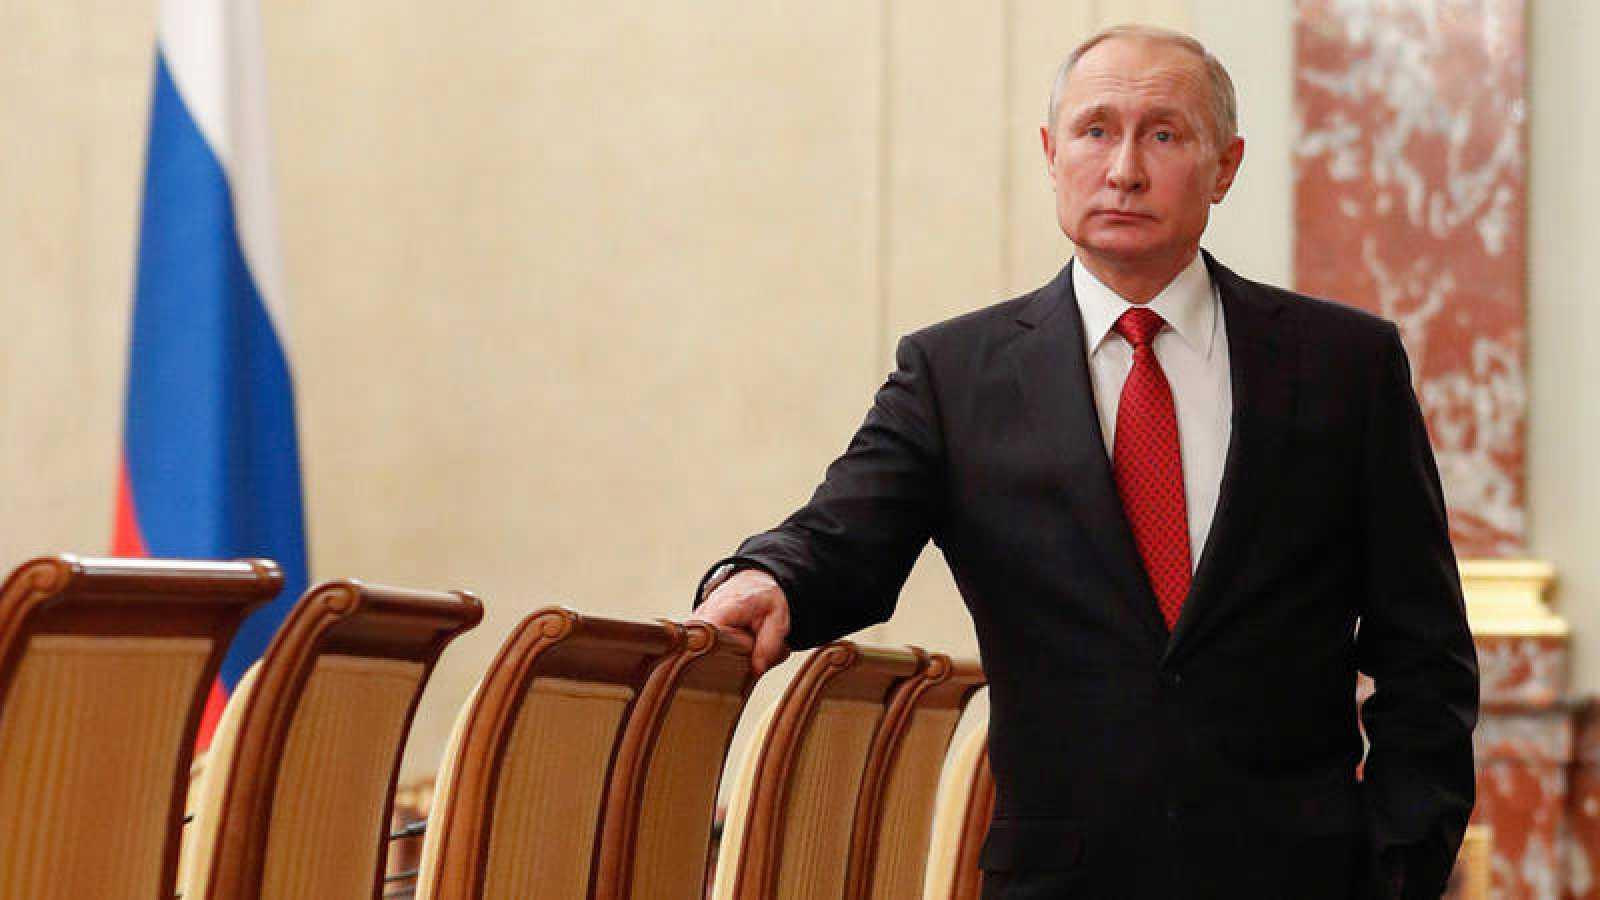 Rusia: Putin, cambiar para perdurar - RTVE.es